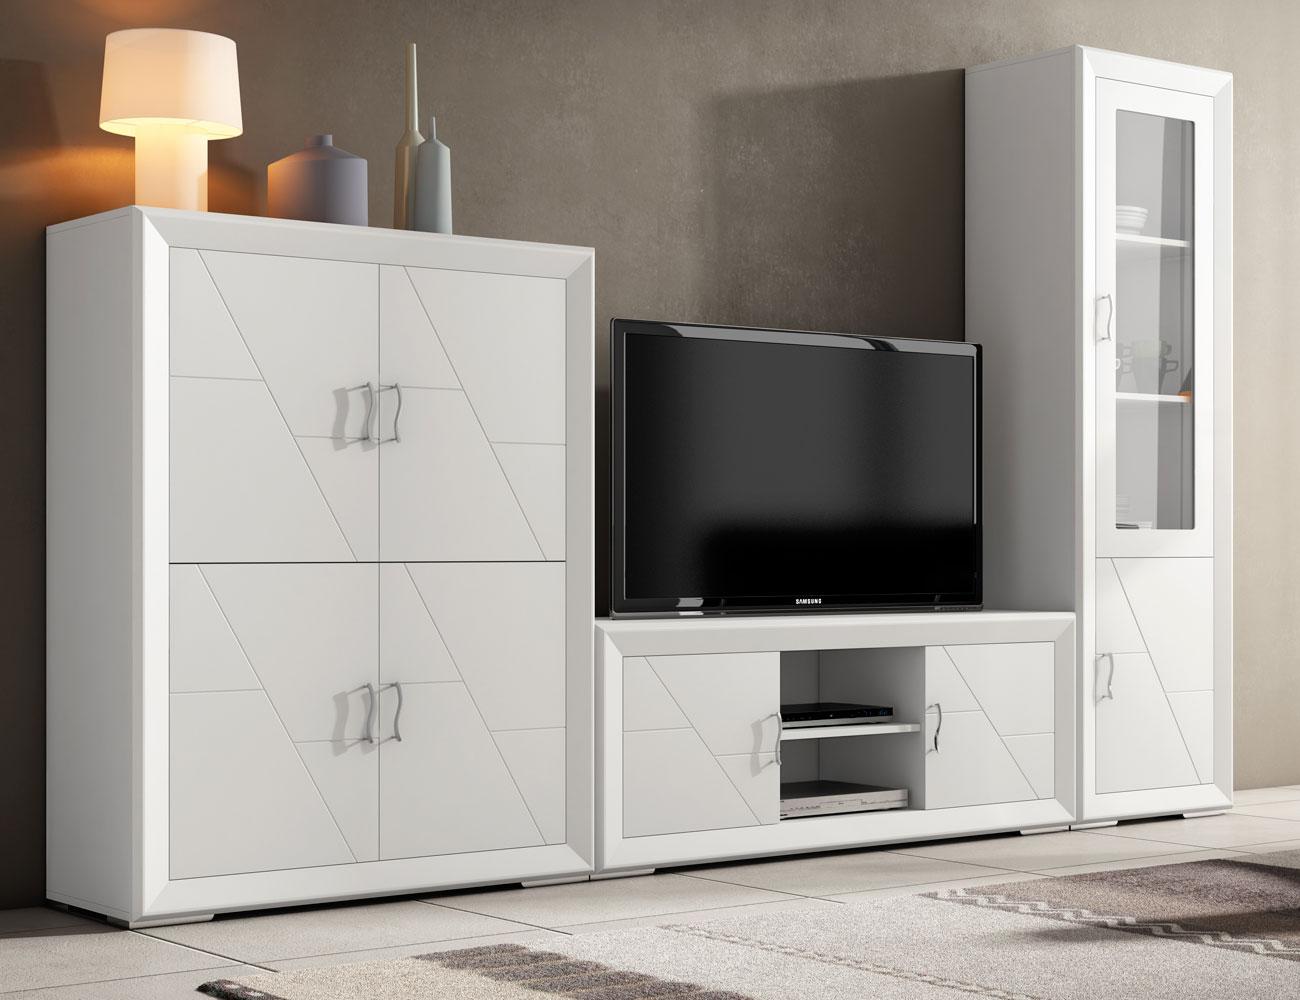 Apilable3 mueble salon comedor blanco madera dm1